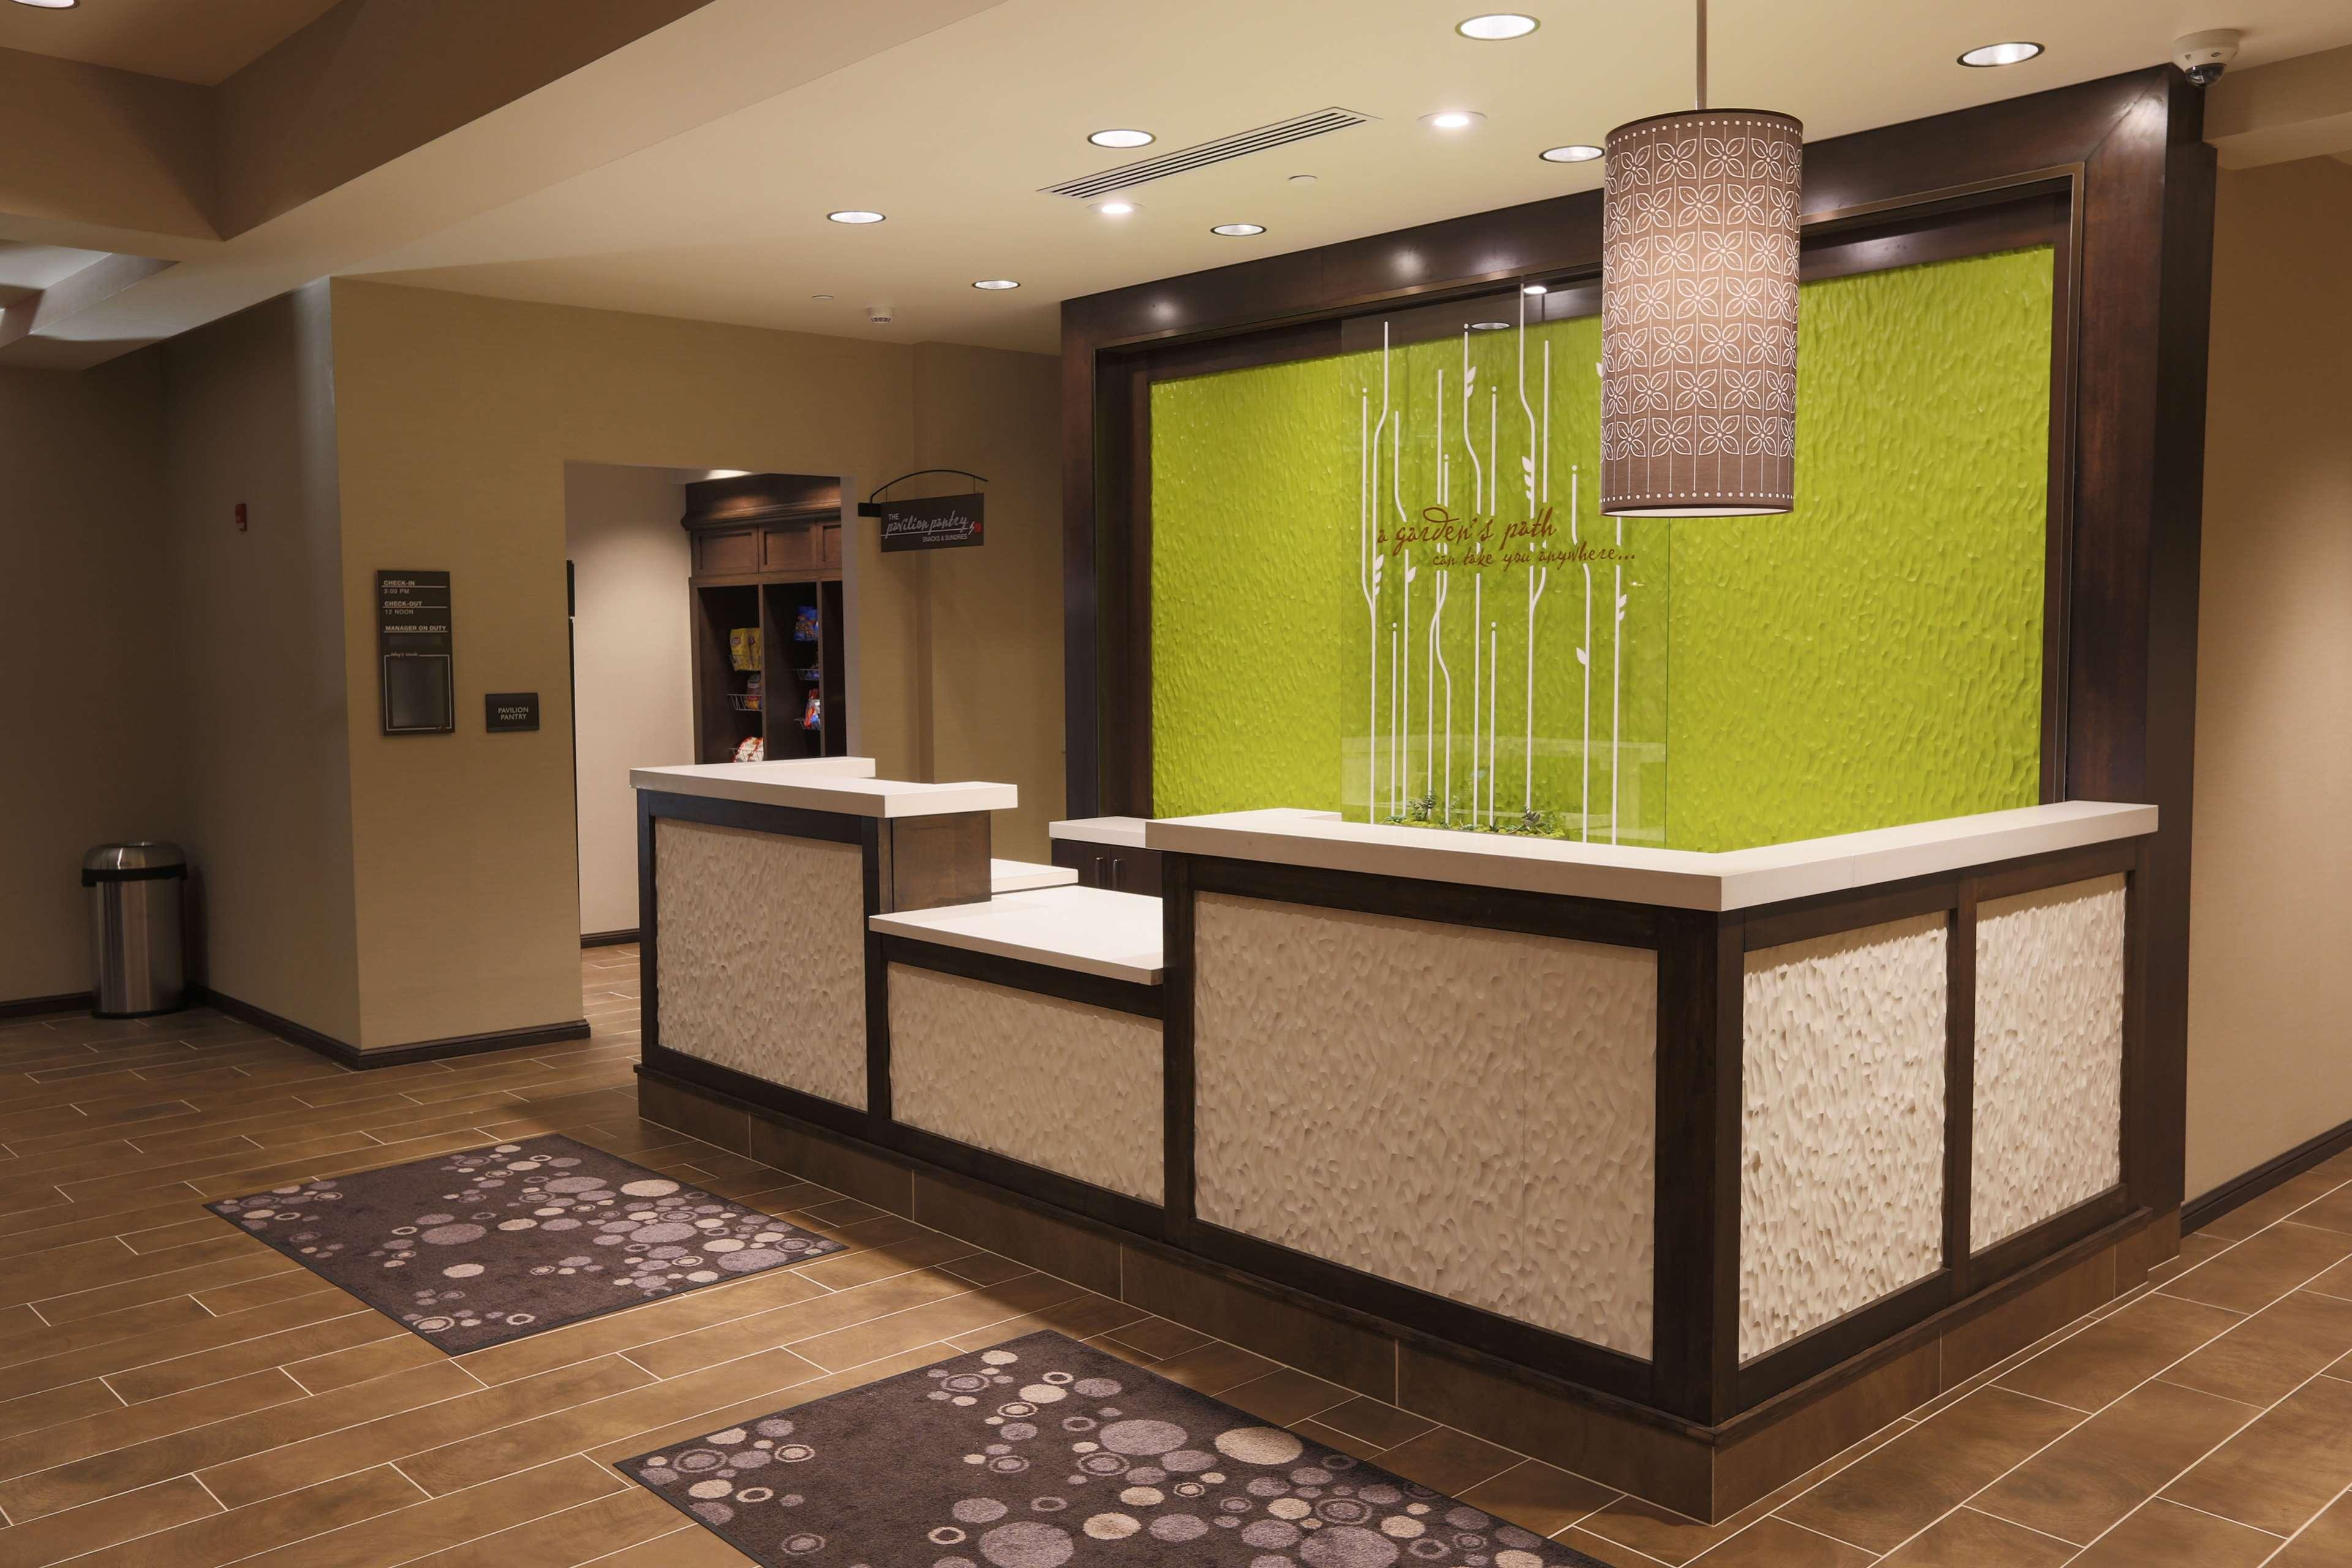 Hilton Garden Inn Indiana at IUP image 2